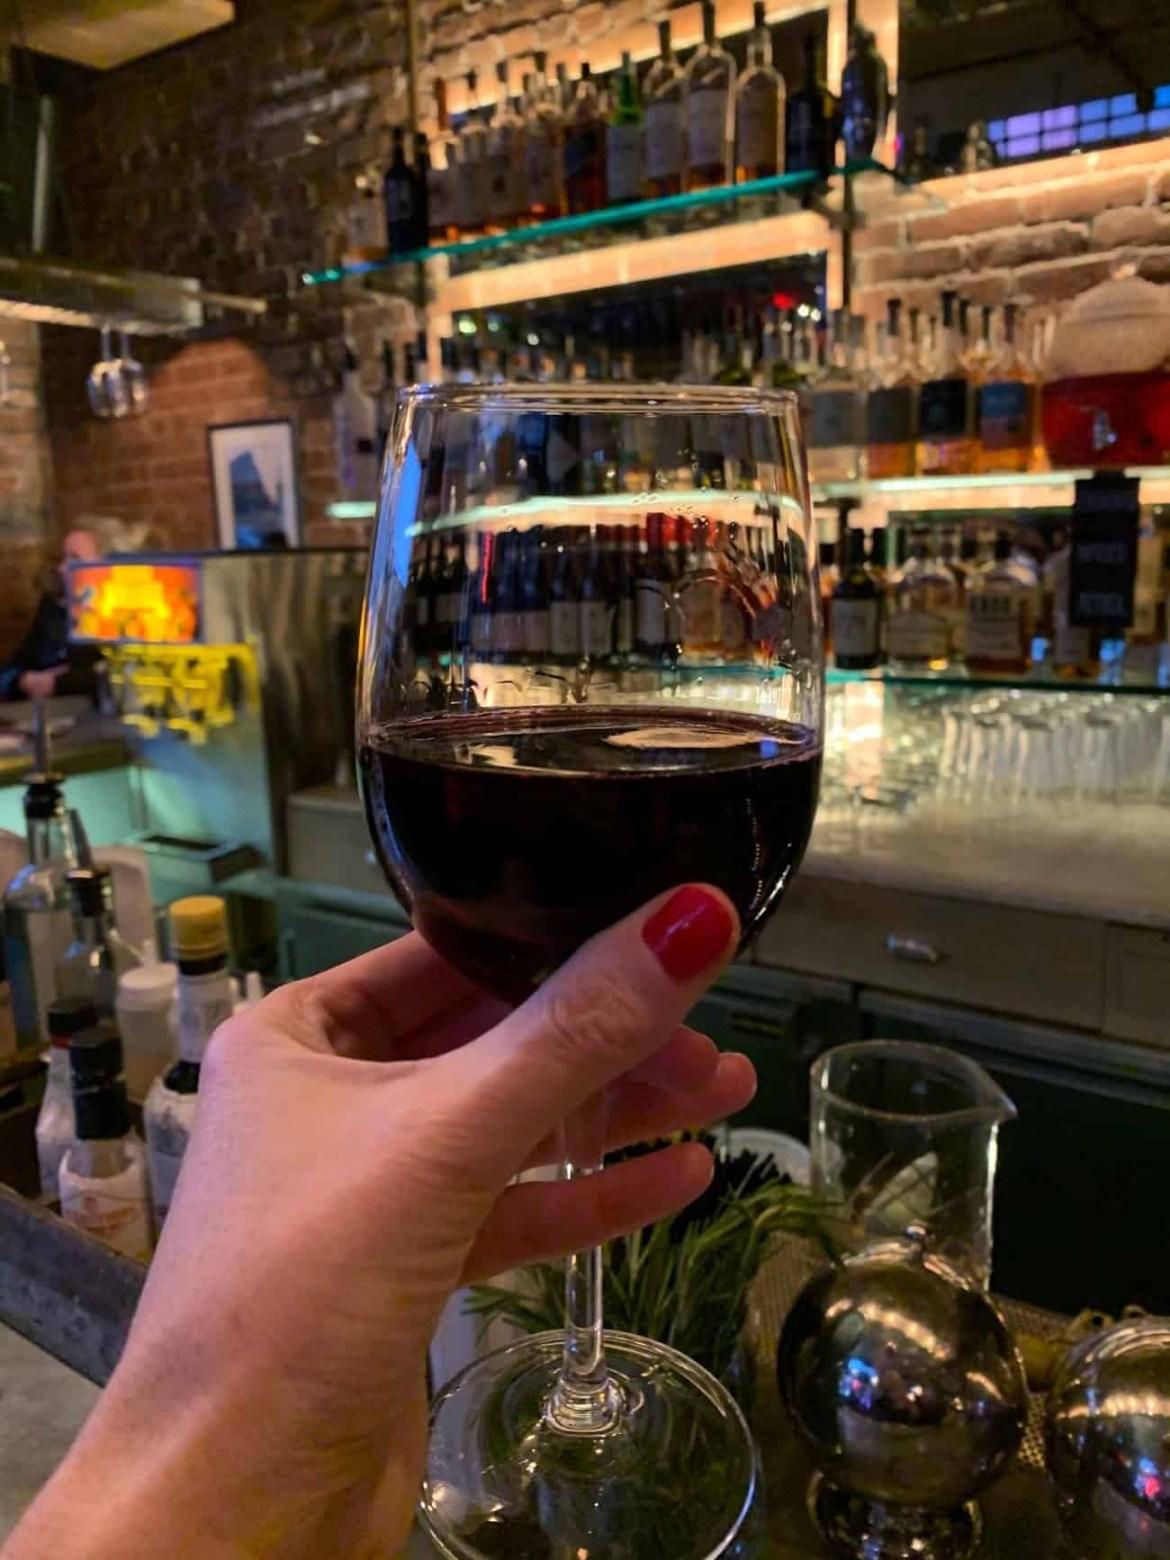 Enjoying a drink in Little Italy